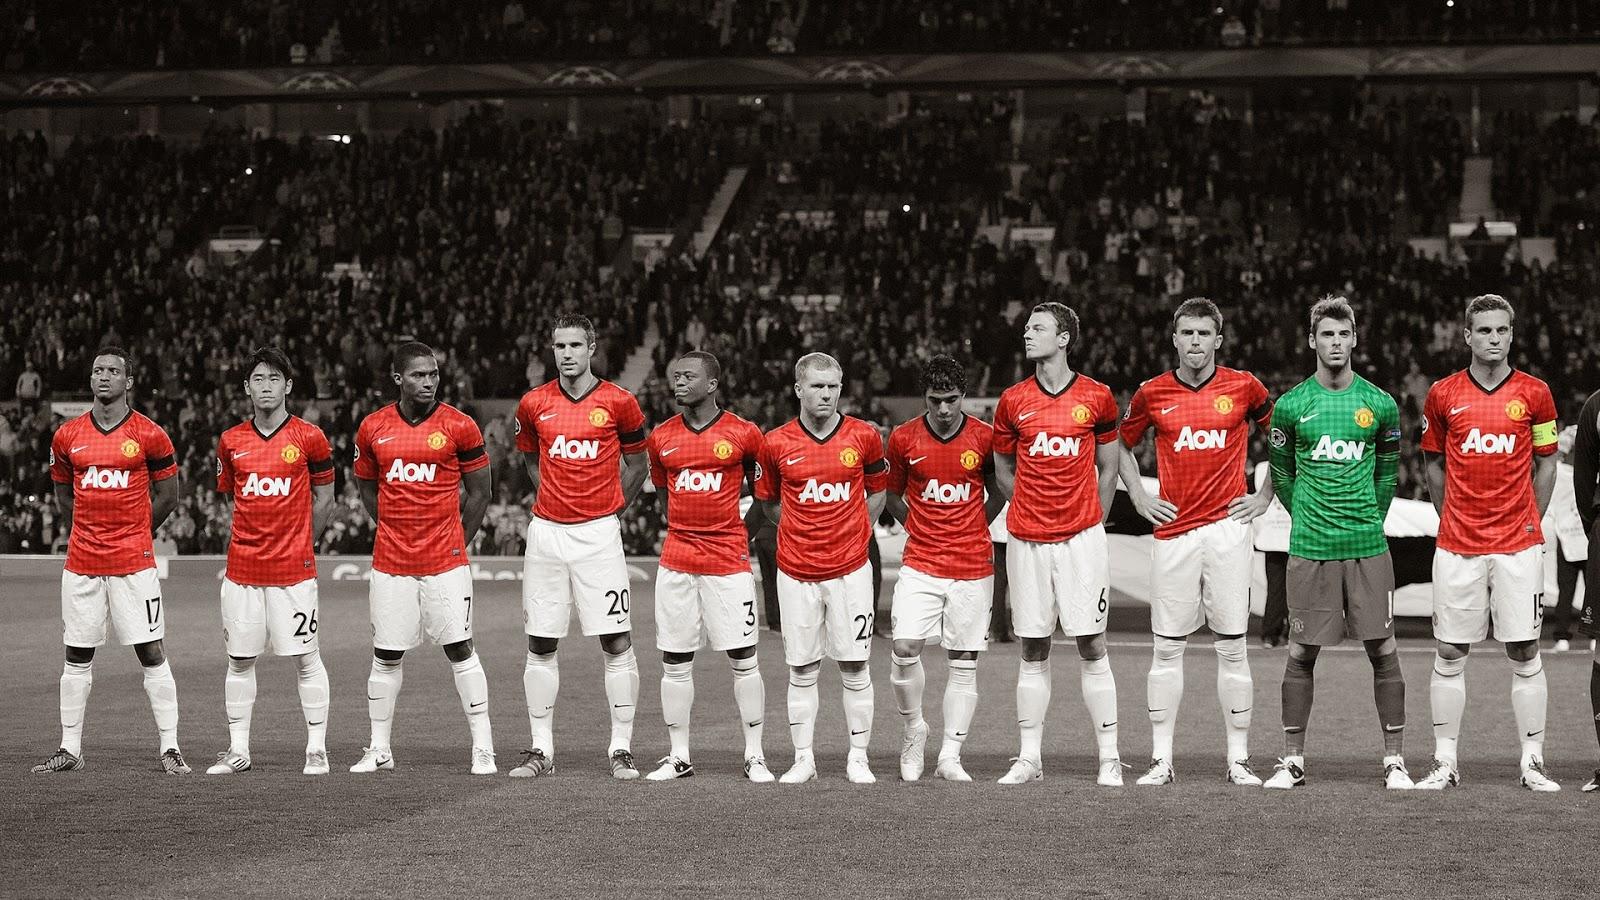 Manchester United Football Club Wallpaper